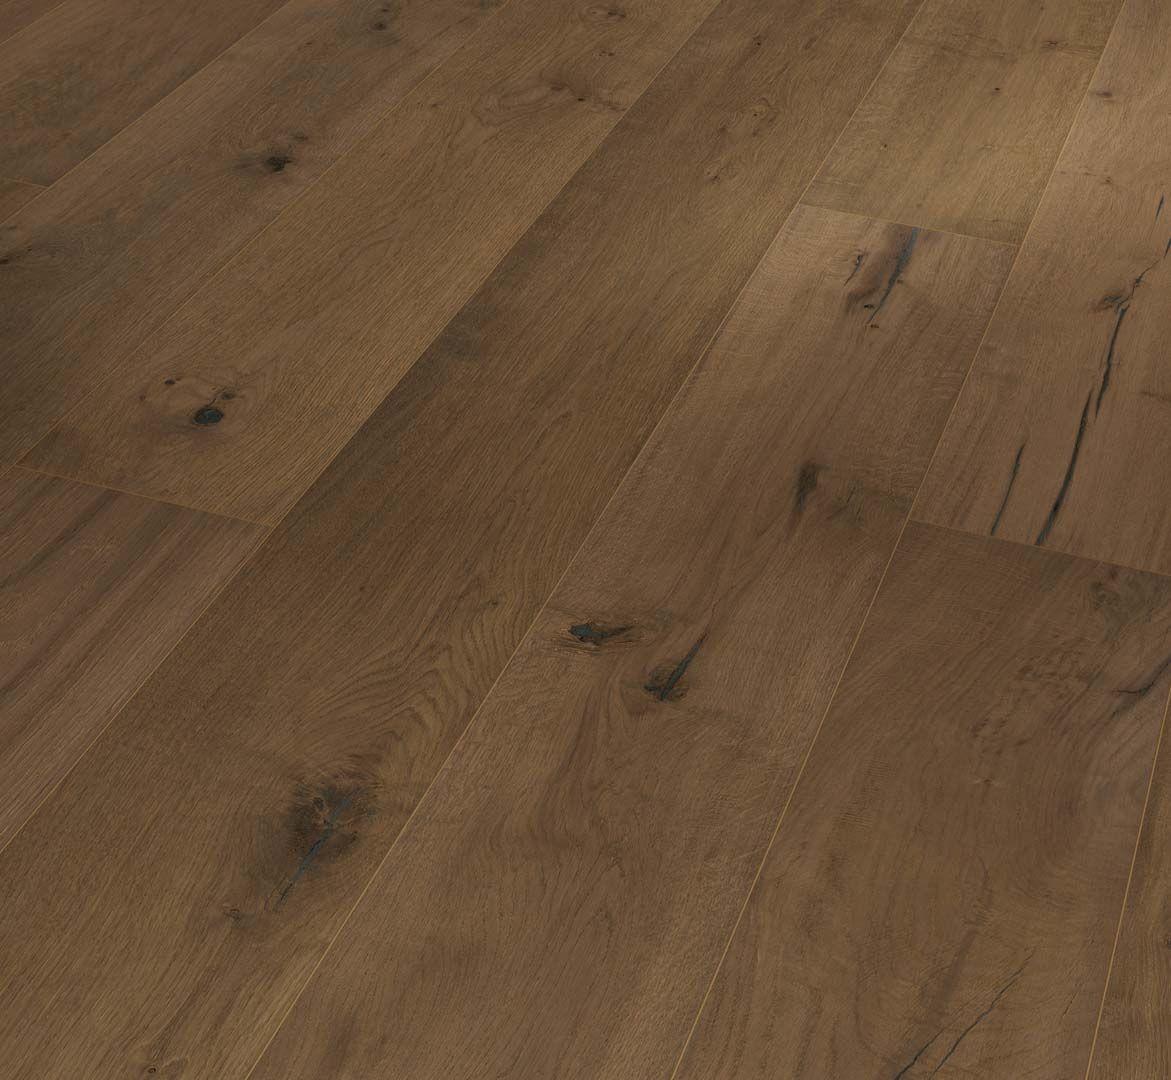 PARADOR Parkett Eiche smoked grey handscraped Landhausdiele 4-seitige Fase | Trendtime 8 | 35 m²